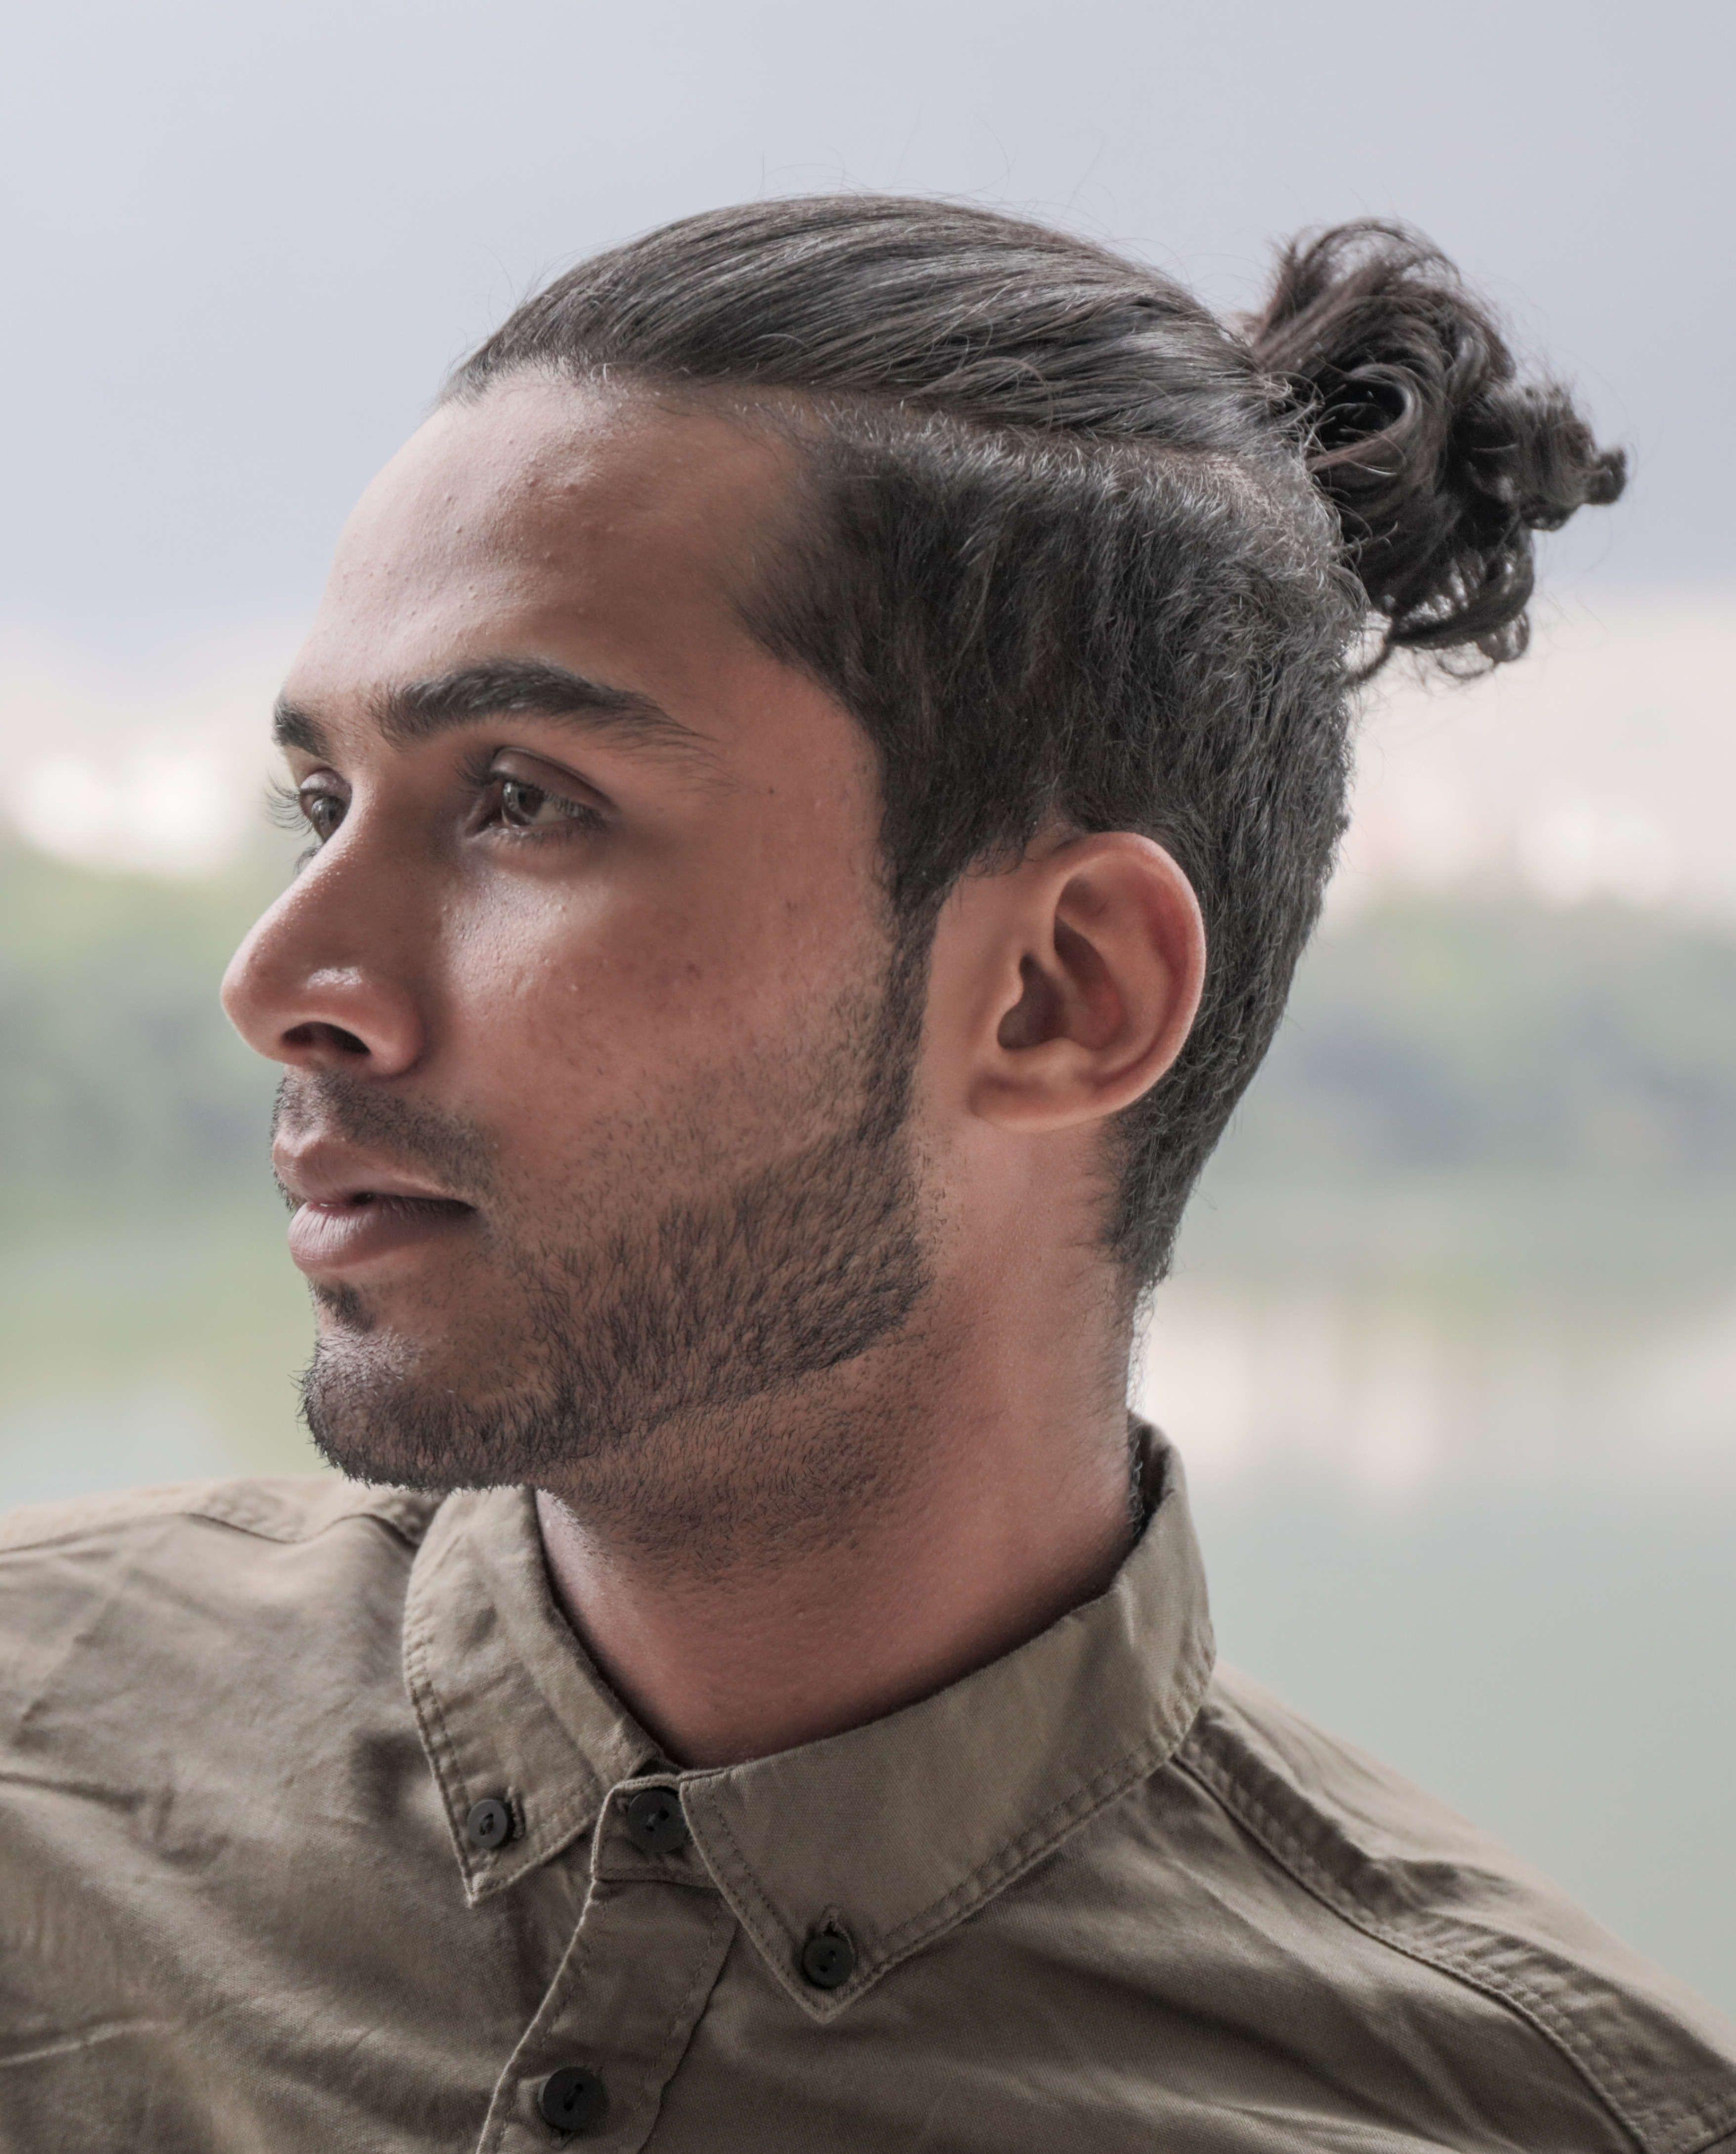 85 Amazing Hairbun For Men That Ll Inspire You For Your Next Haircut Man Bun Hairstyles Man Ponytail Man Bun Top Knot